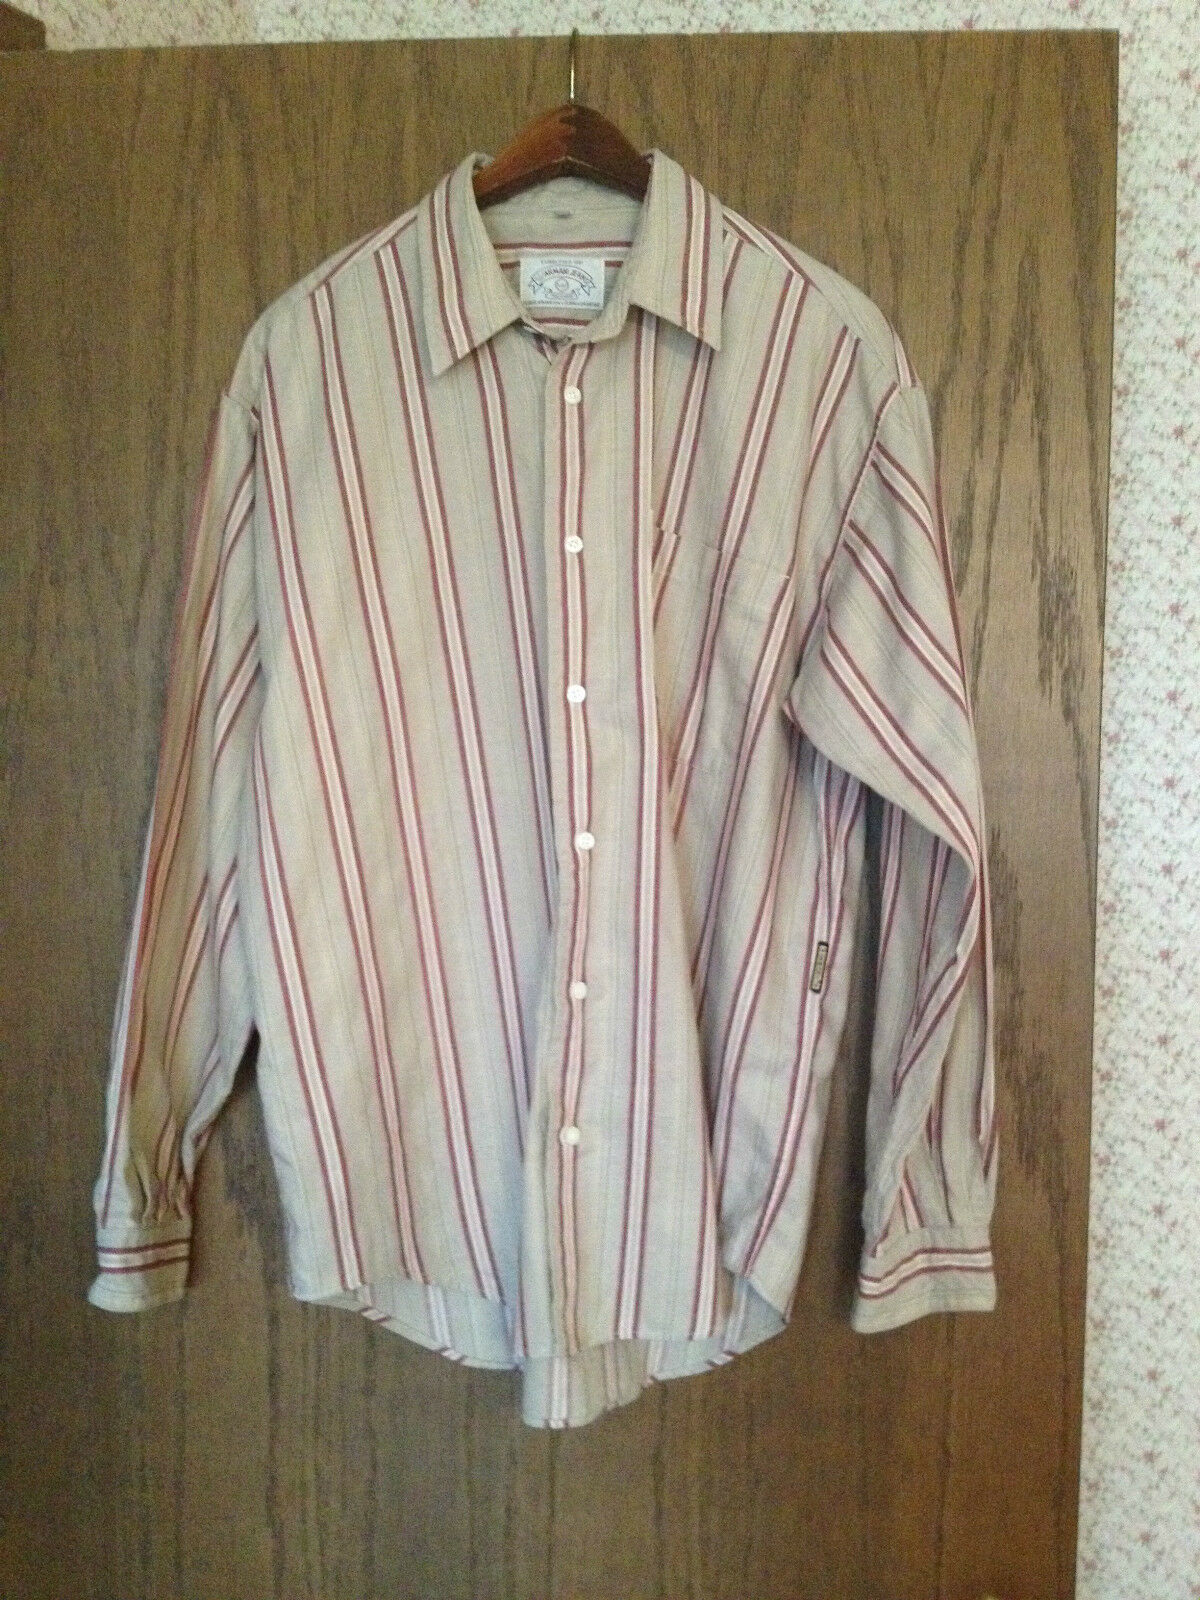 Men's  Armani Jeans  Tan & Maroon Striped 100% Cotton Long Sleeved Shirt Size M